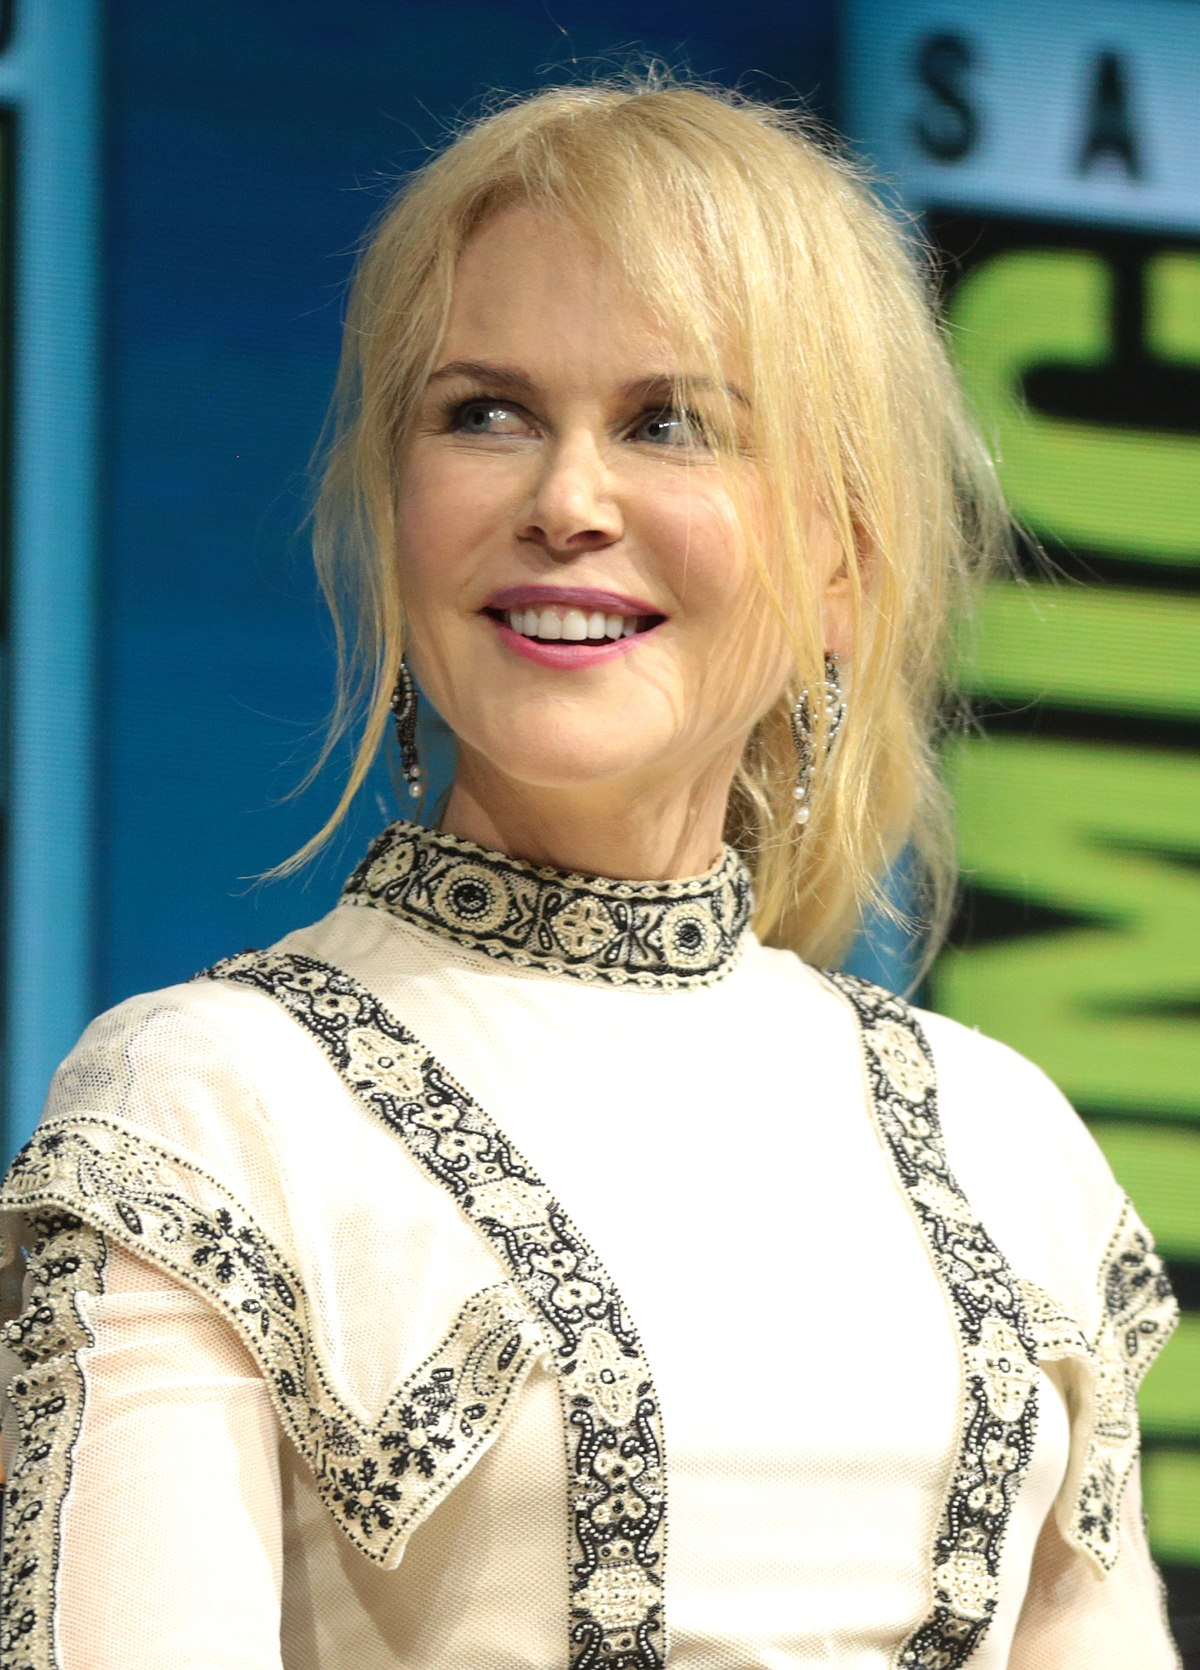 Nicole Kidman - Wikipedija, prosta enciklopedija